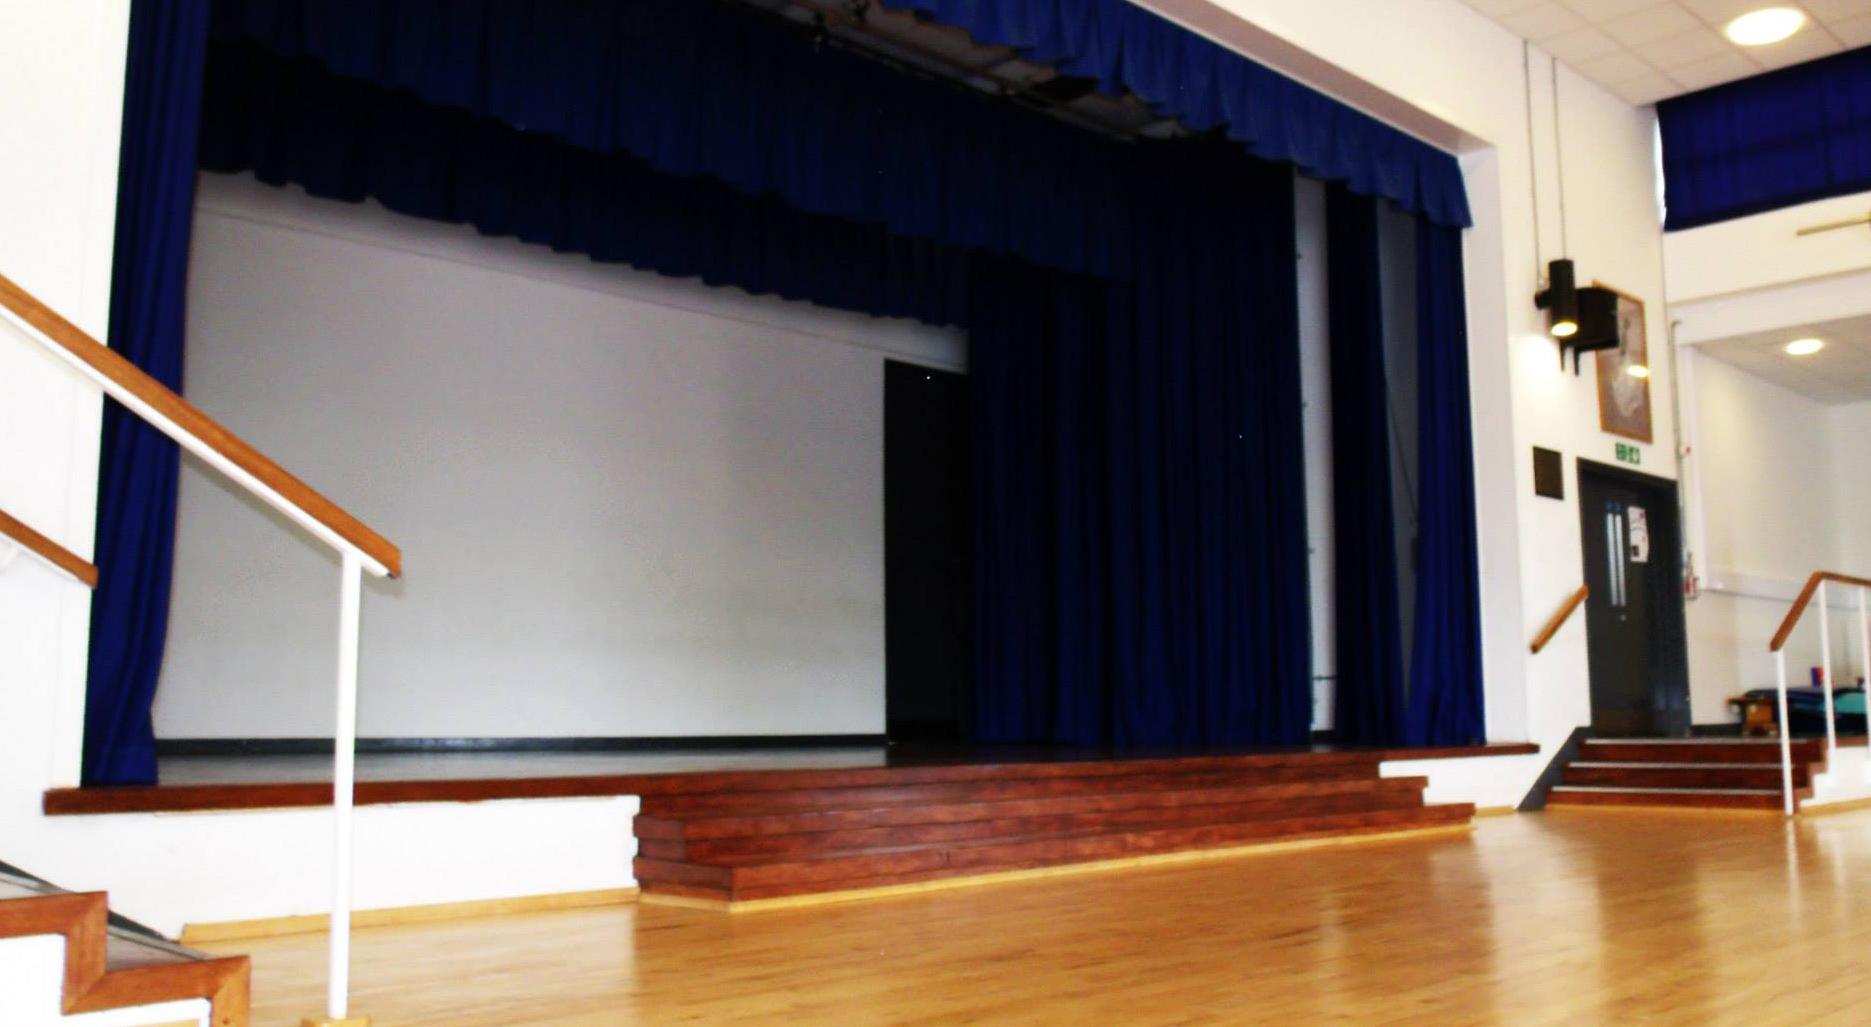 Firman Hall